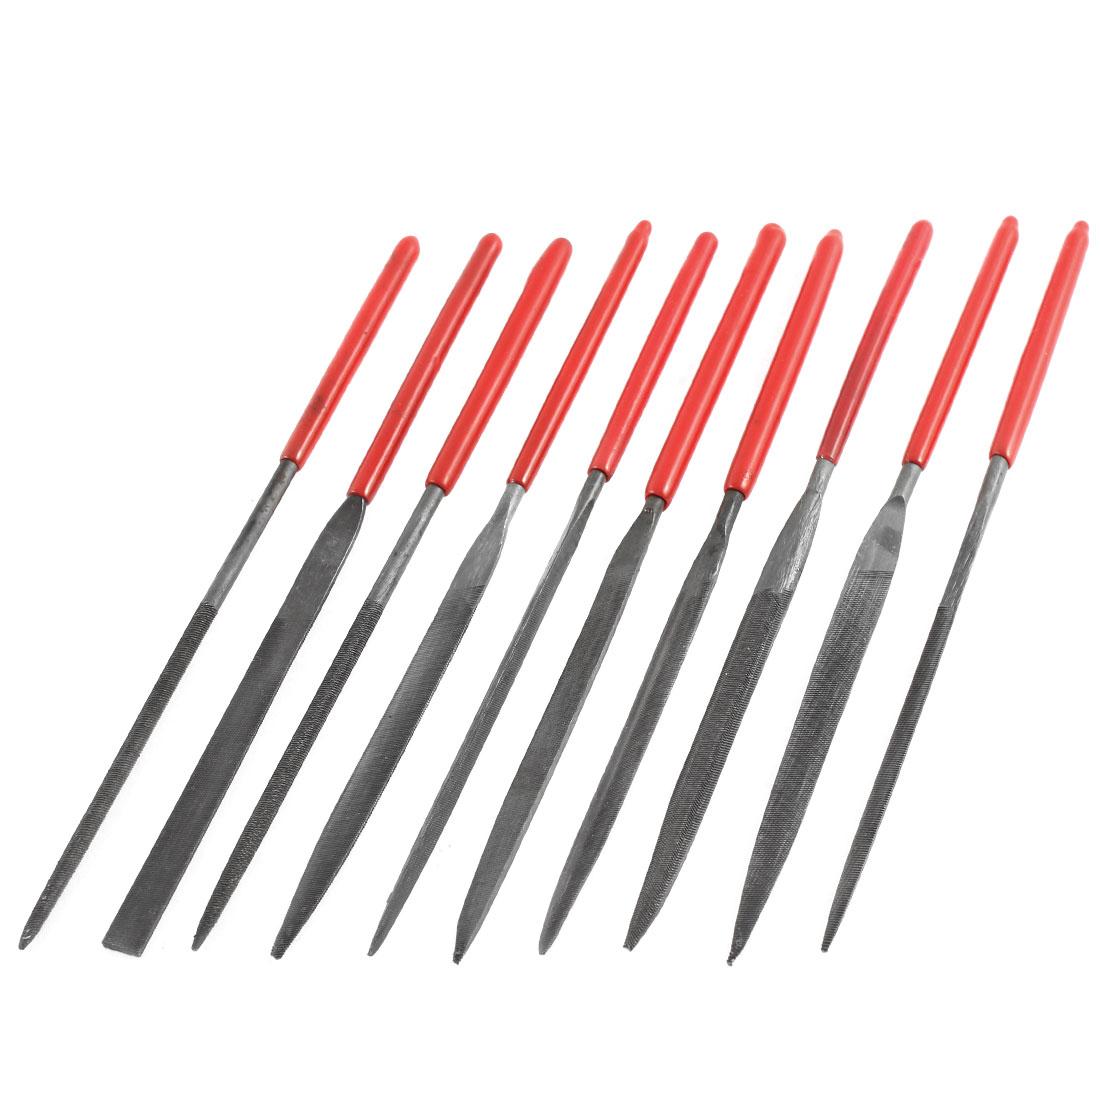 10 Pcs Wood Carving Craft Hardware Precision Mini Needle File Set 3 x 140mm